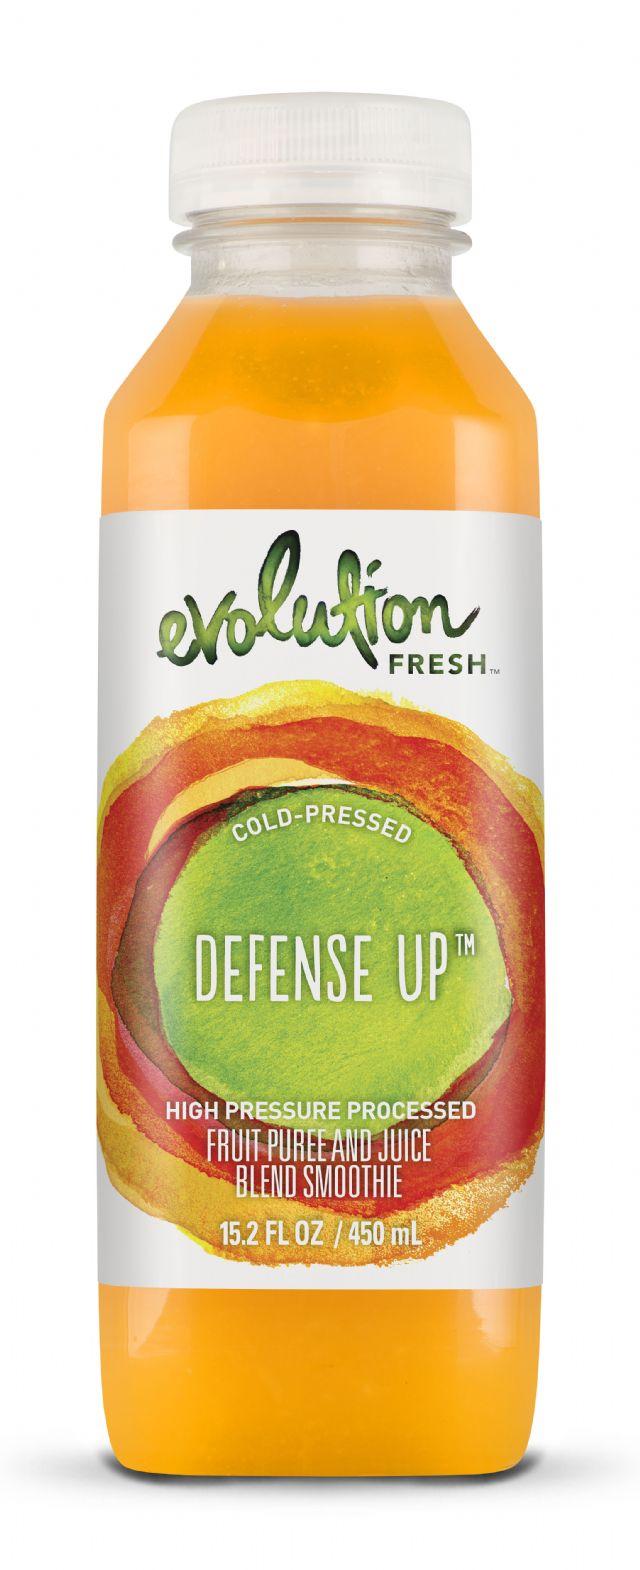 Evolution Fresh: DefenseUp copy